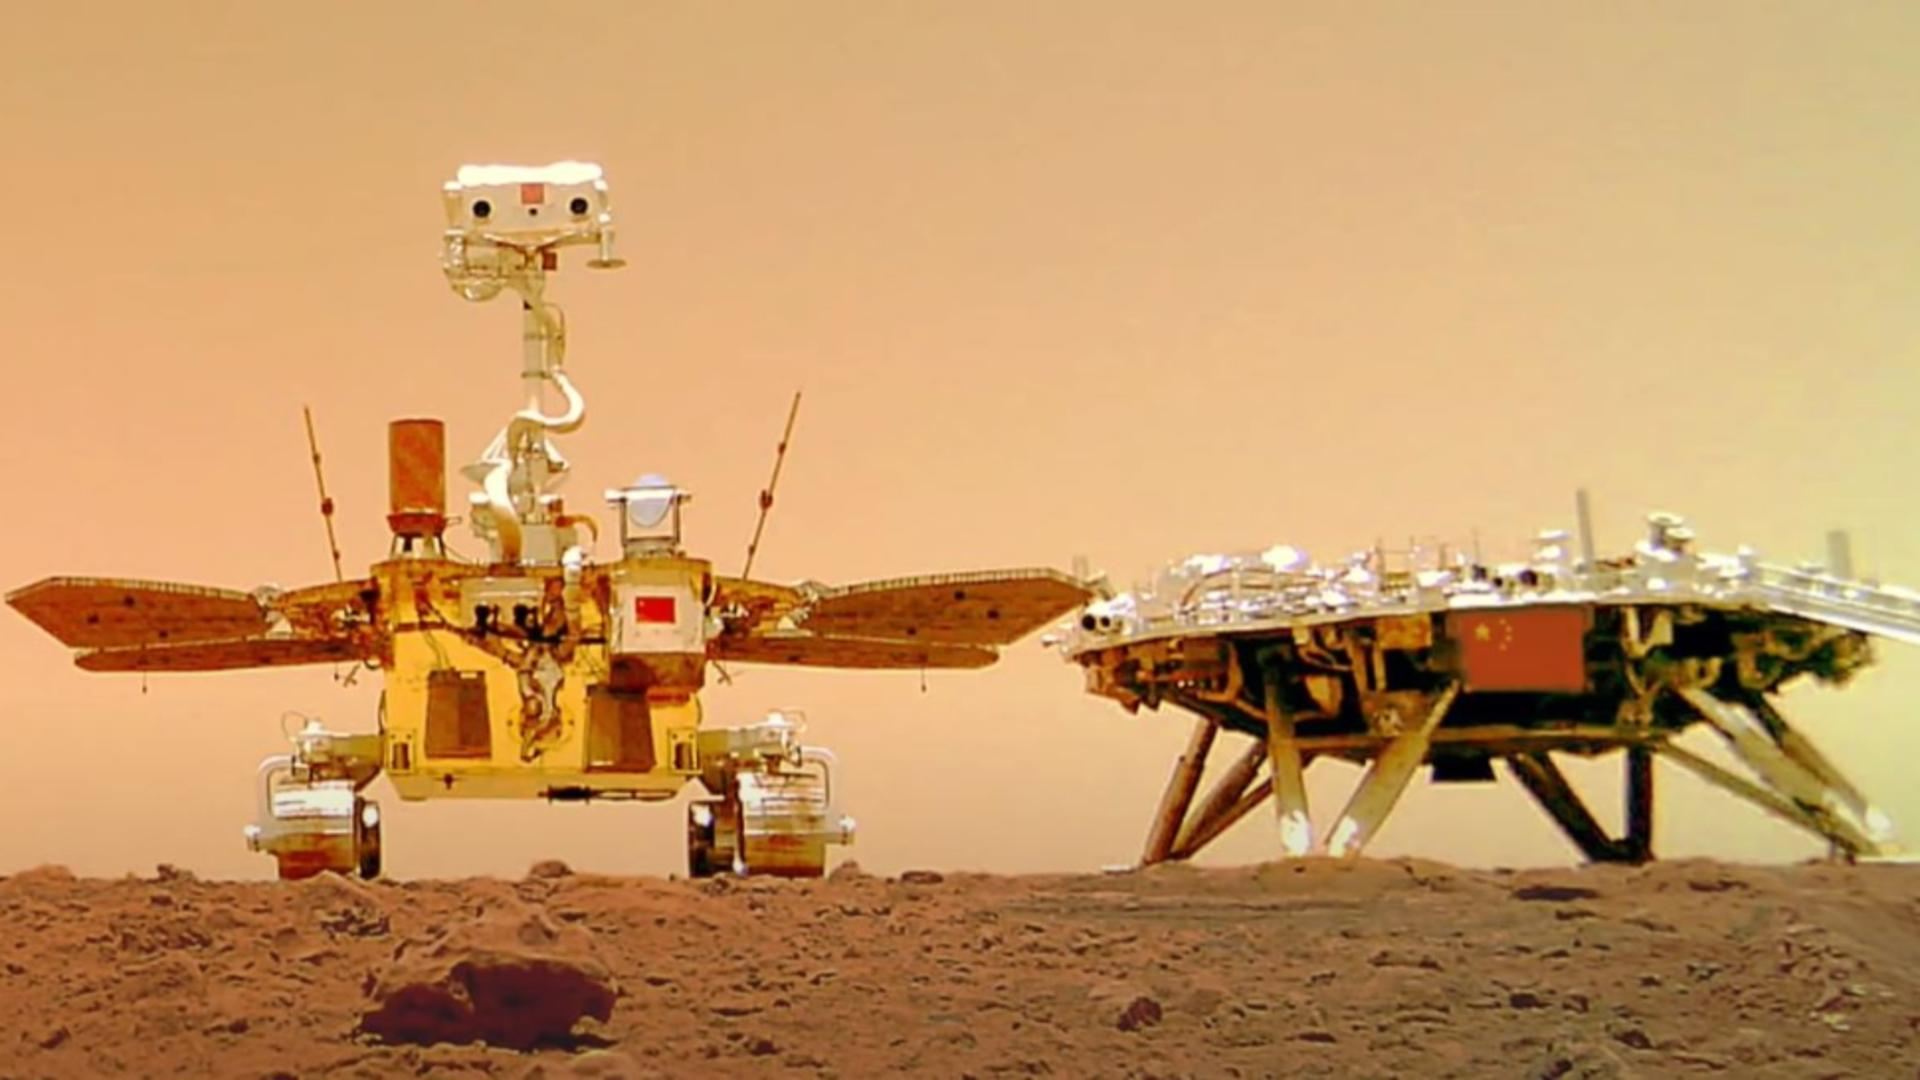 Noi imagini cu roverul chinezesc Zhurong de pe planeta Marte.Foto/CNSA